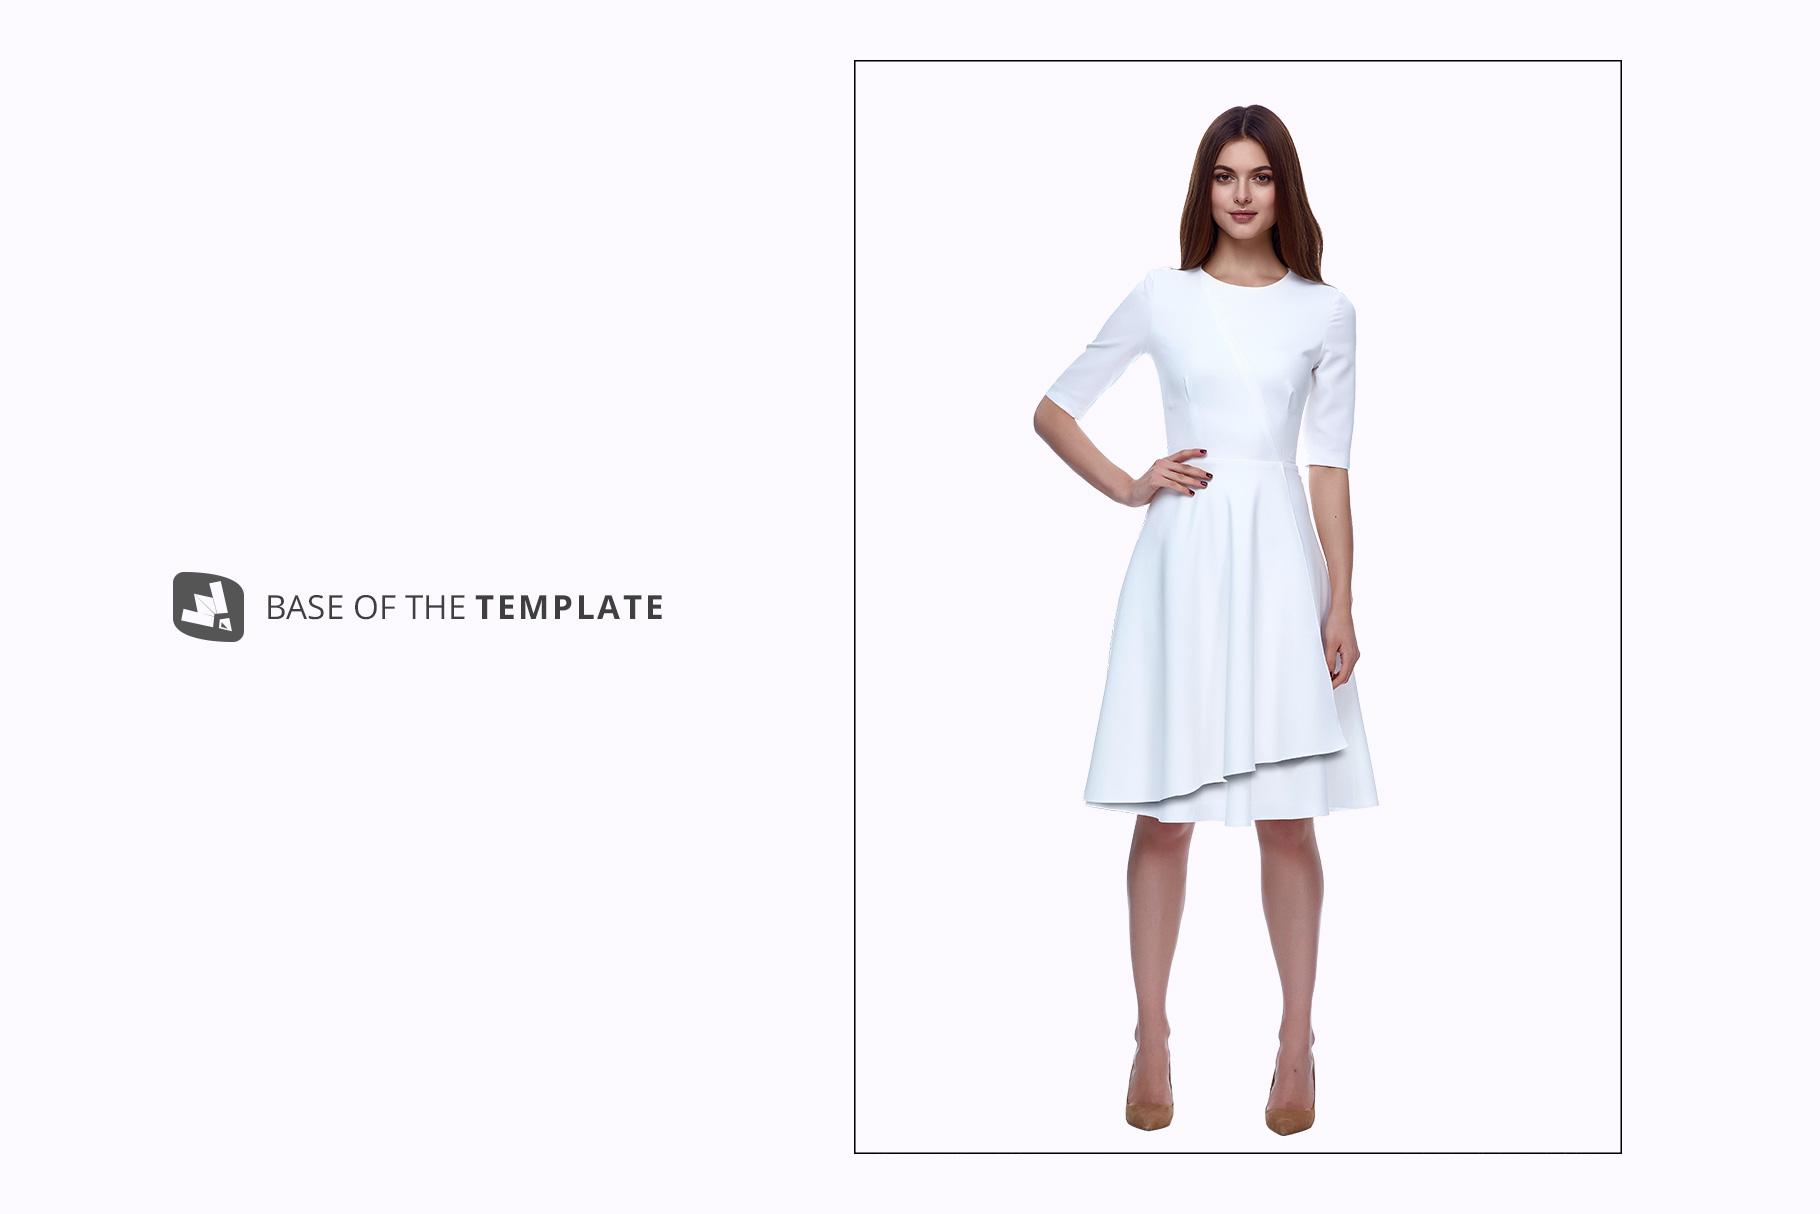 base image of the female formal dress mockup